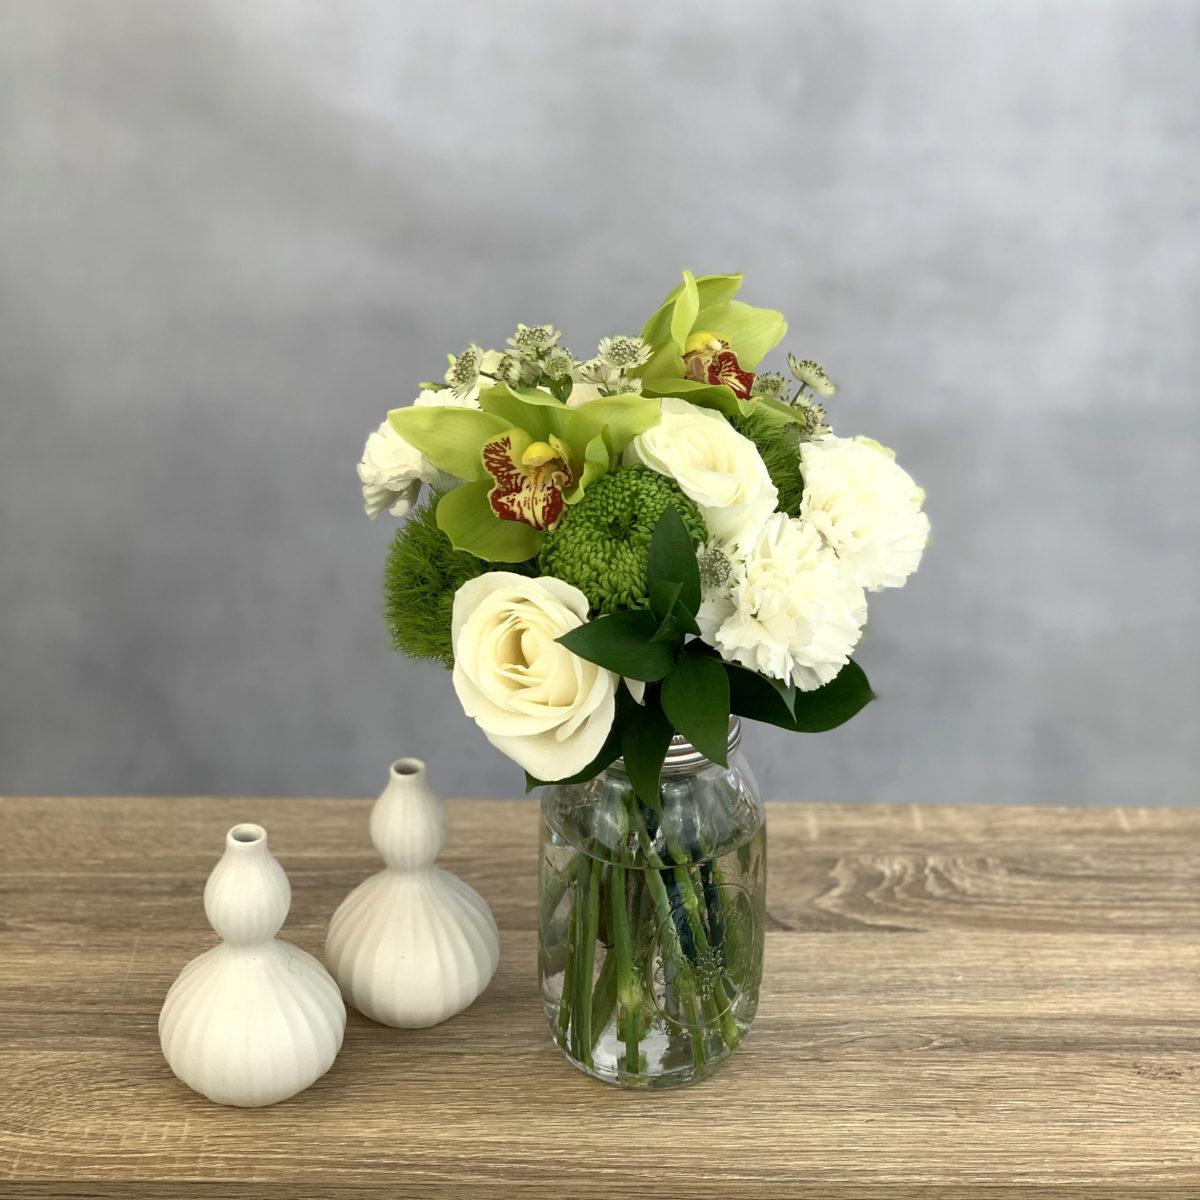 Rachel Cho Flowers   Floral Designer   Flower Delivery